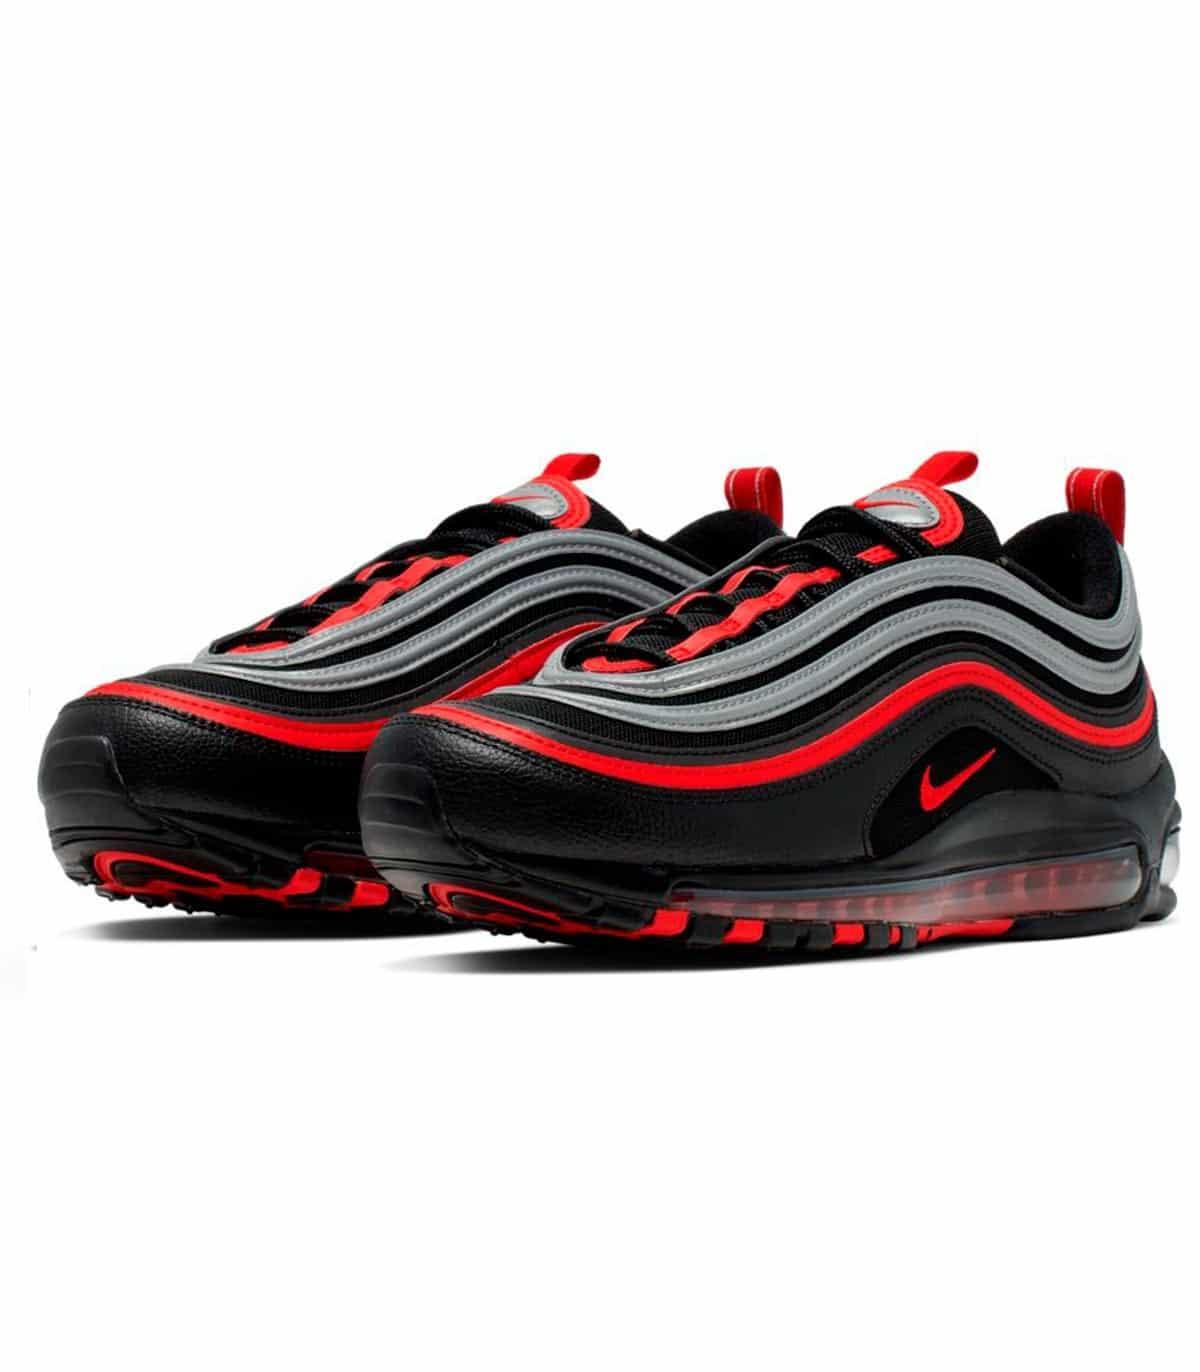 nike air max 97 negras y rojas